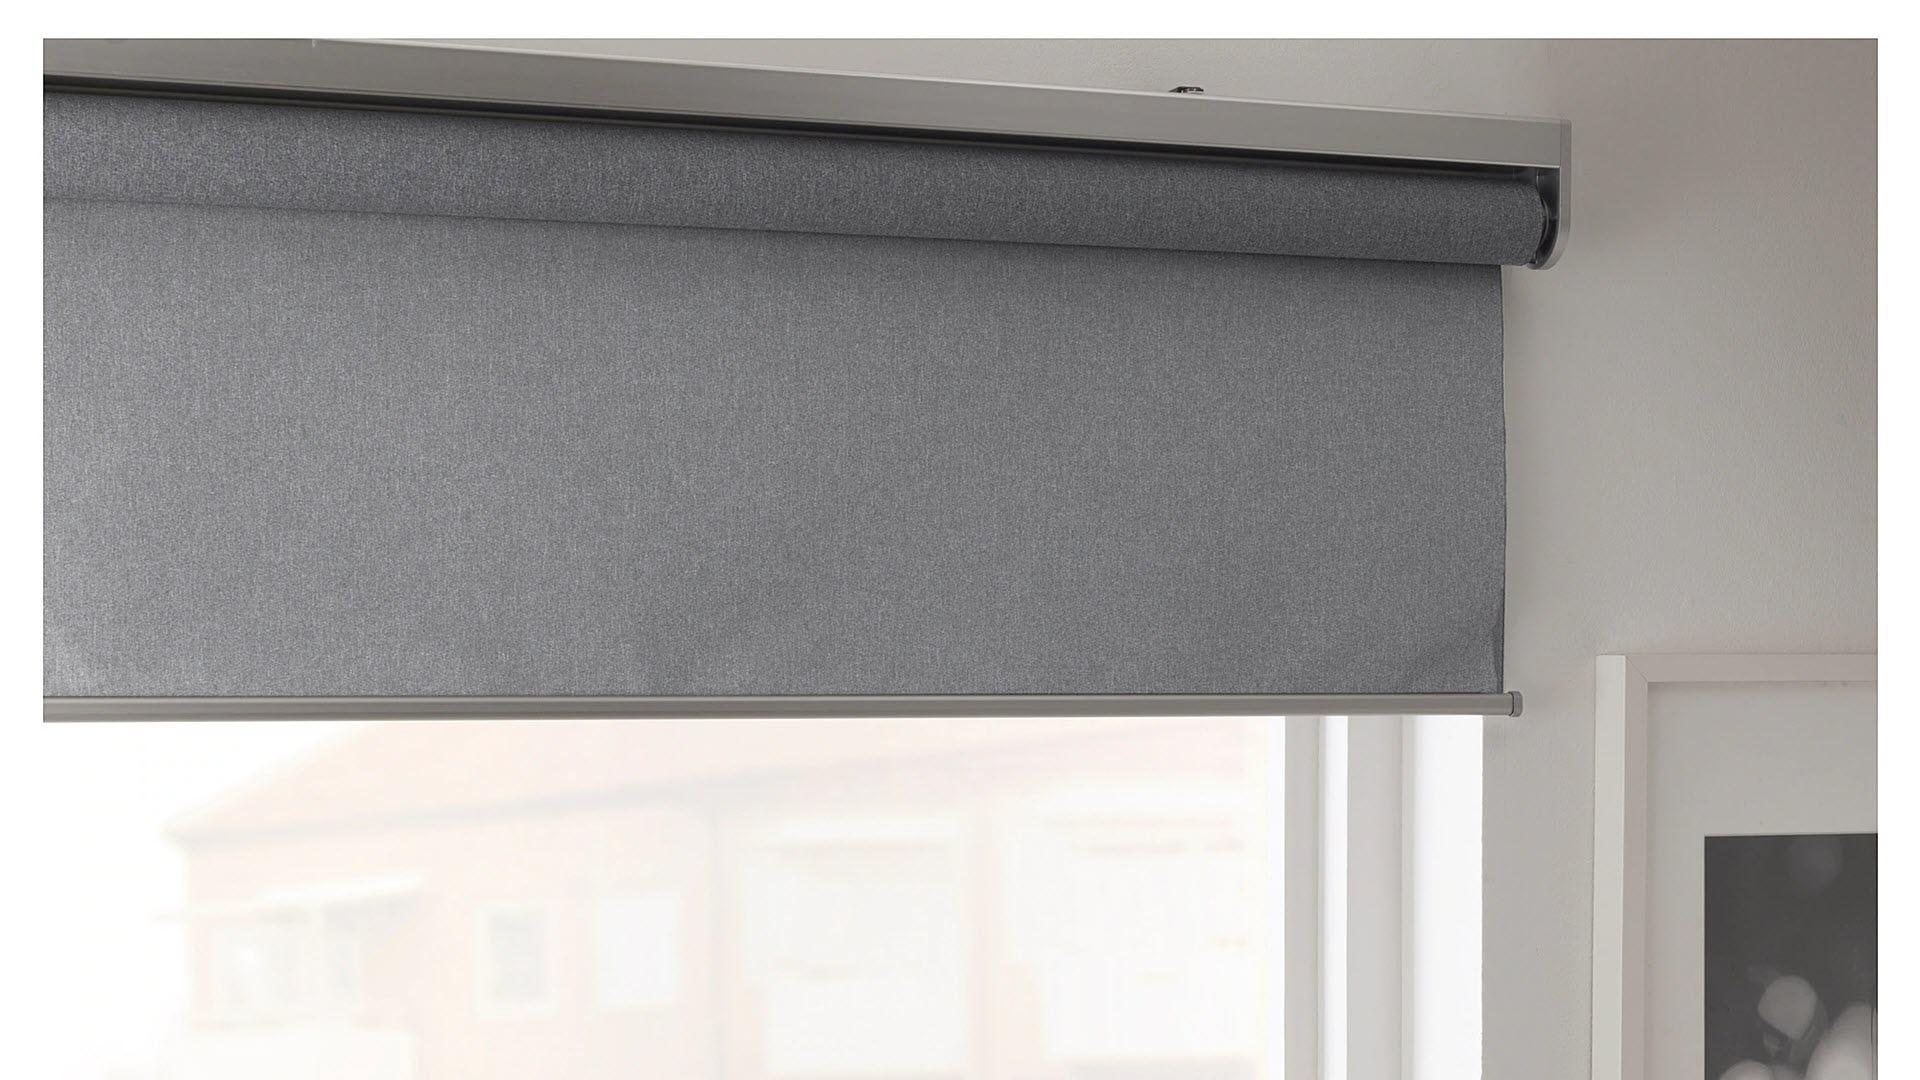 A set of IKEA Fyrtur smart blinds.